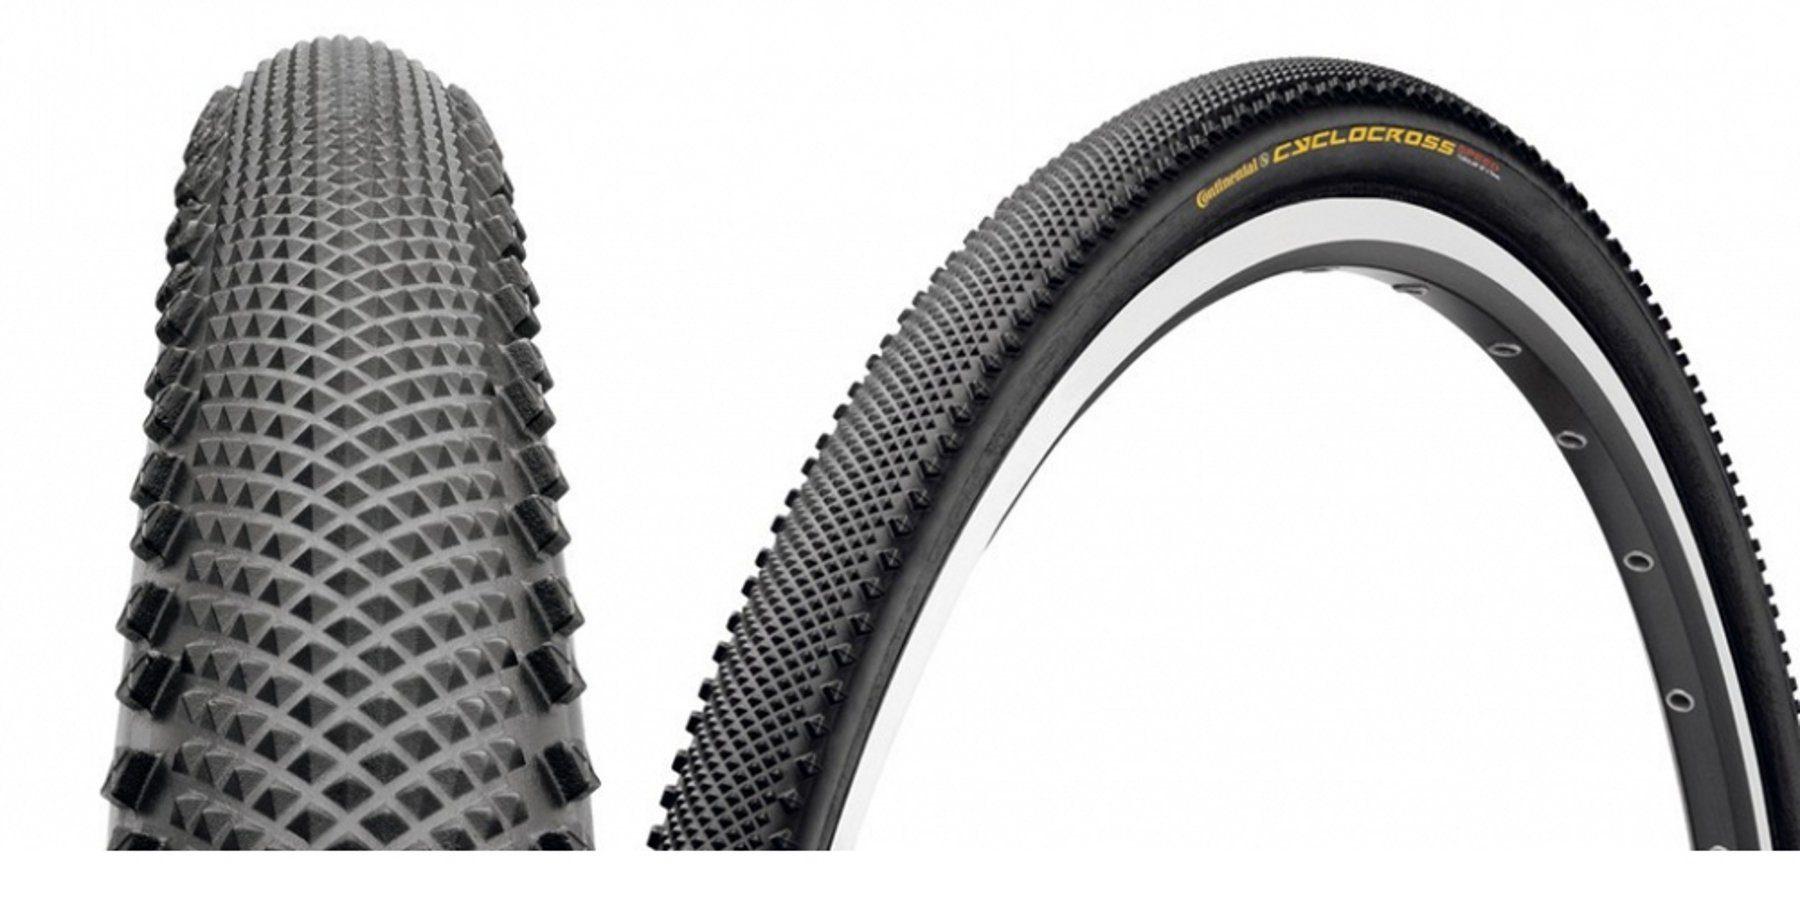 Continental Fahrradreifen »Cyclocross Speed 35-622 Performance faltbar«